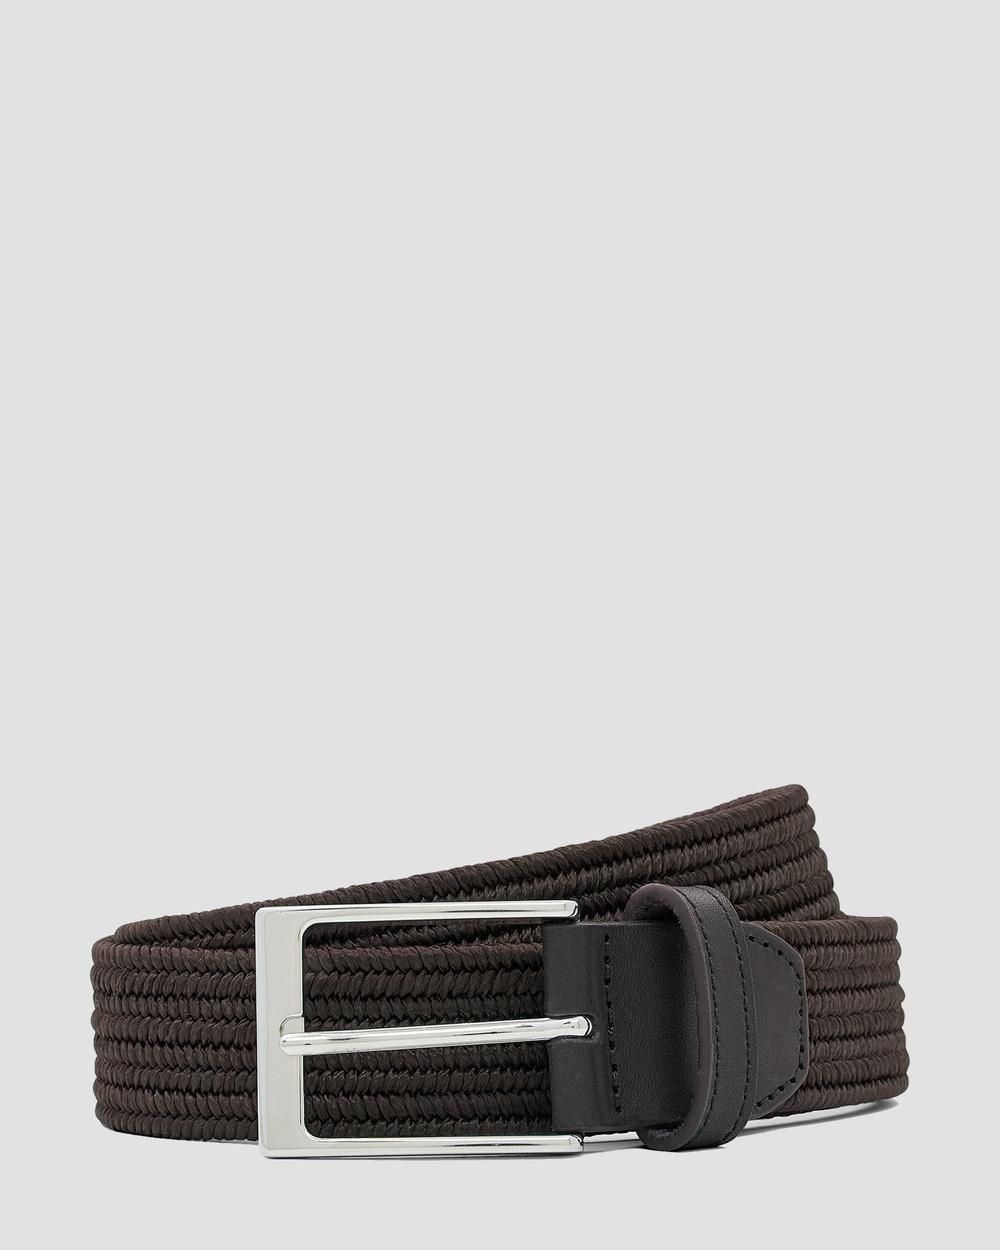 Aquila Pesci Belt Belts Brown